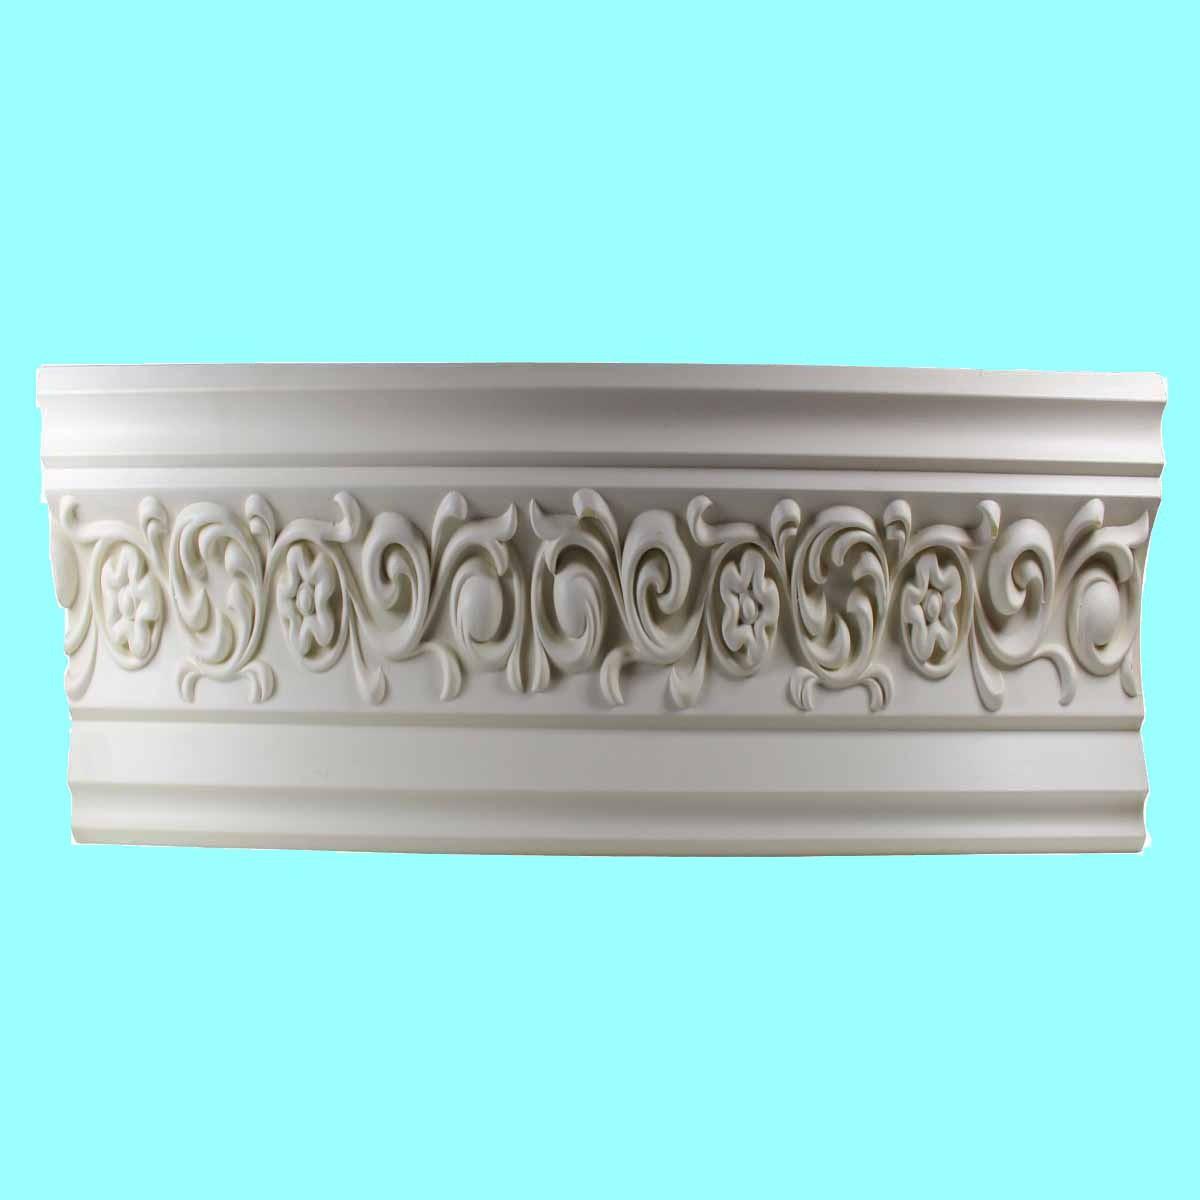 Cornice White Urethane 23.5 Sample of 11385 Cornice Cornice Moulding Cornice Molding